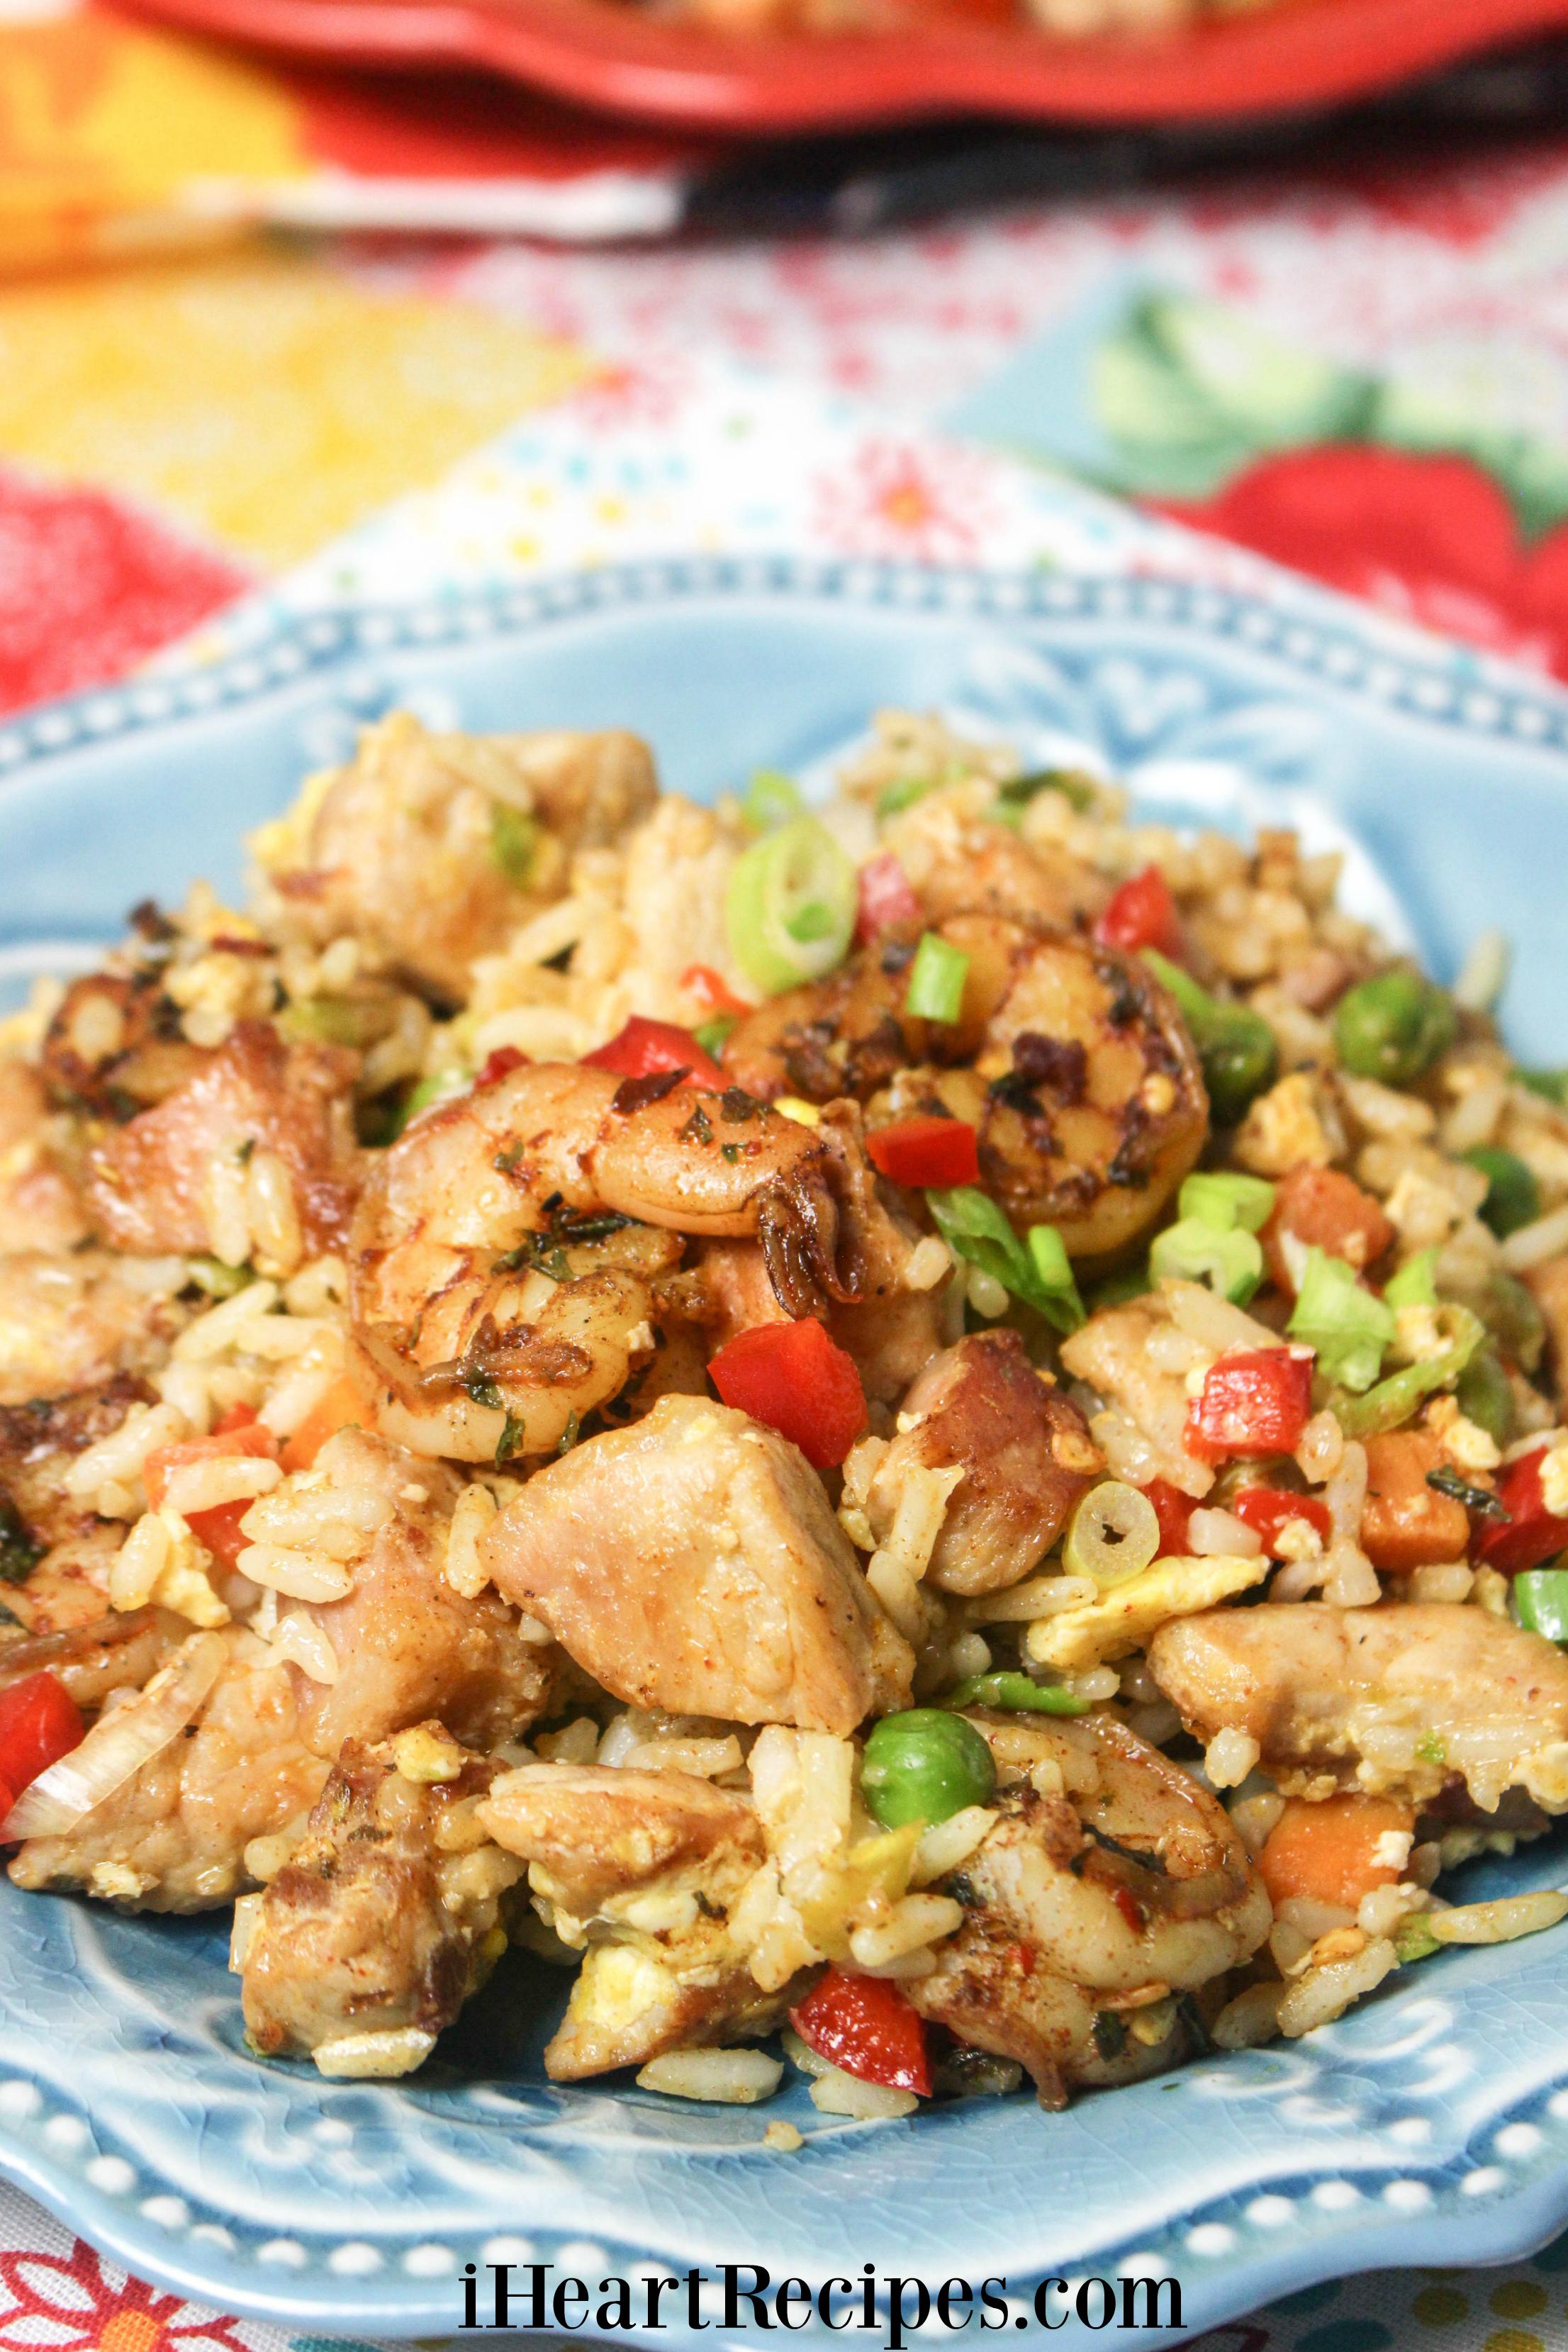 Delicious Pork & Jerk Shrimp Fried Rice